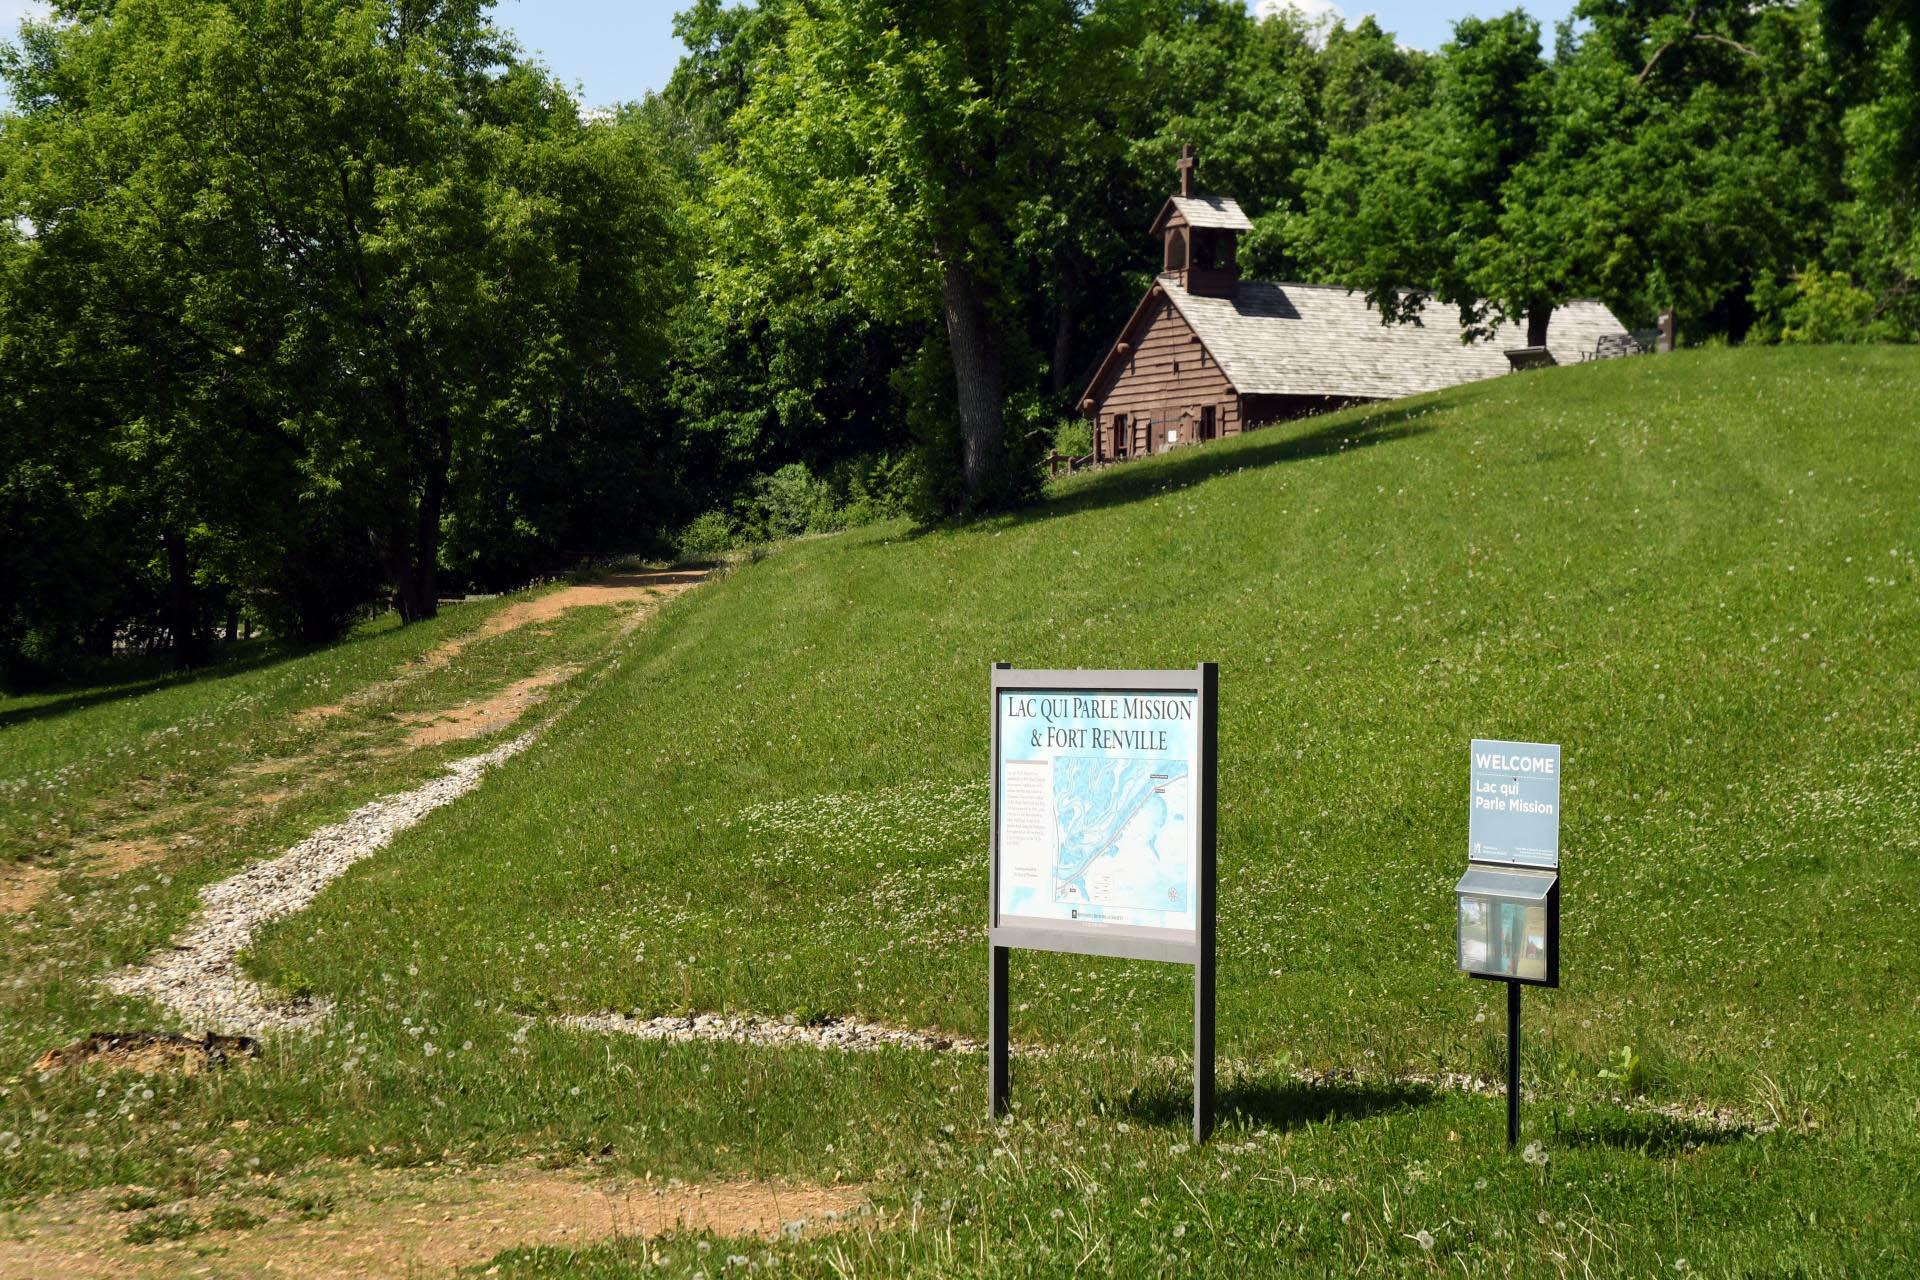 Trail leading towards a historic church.